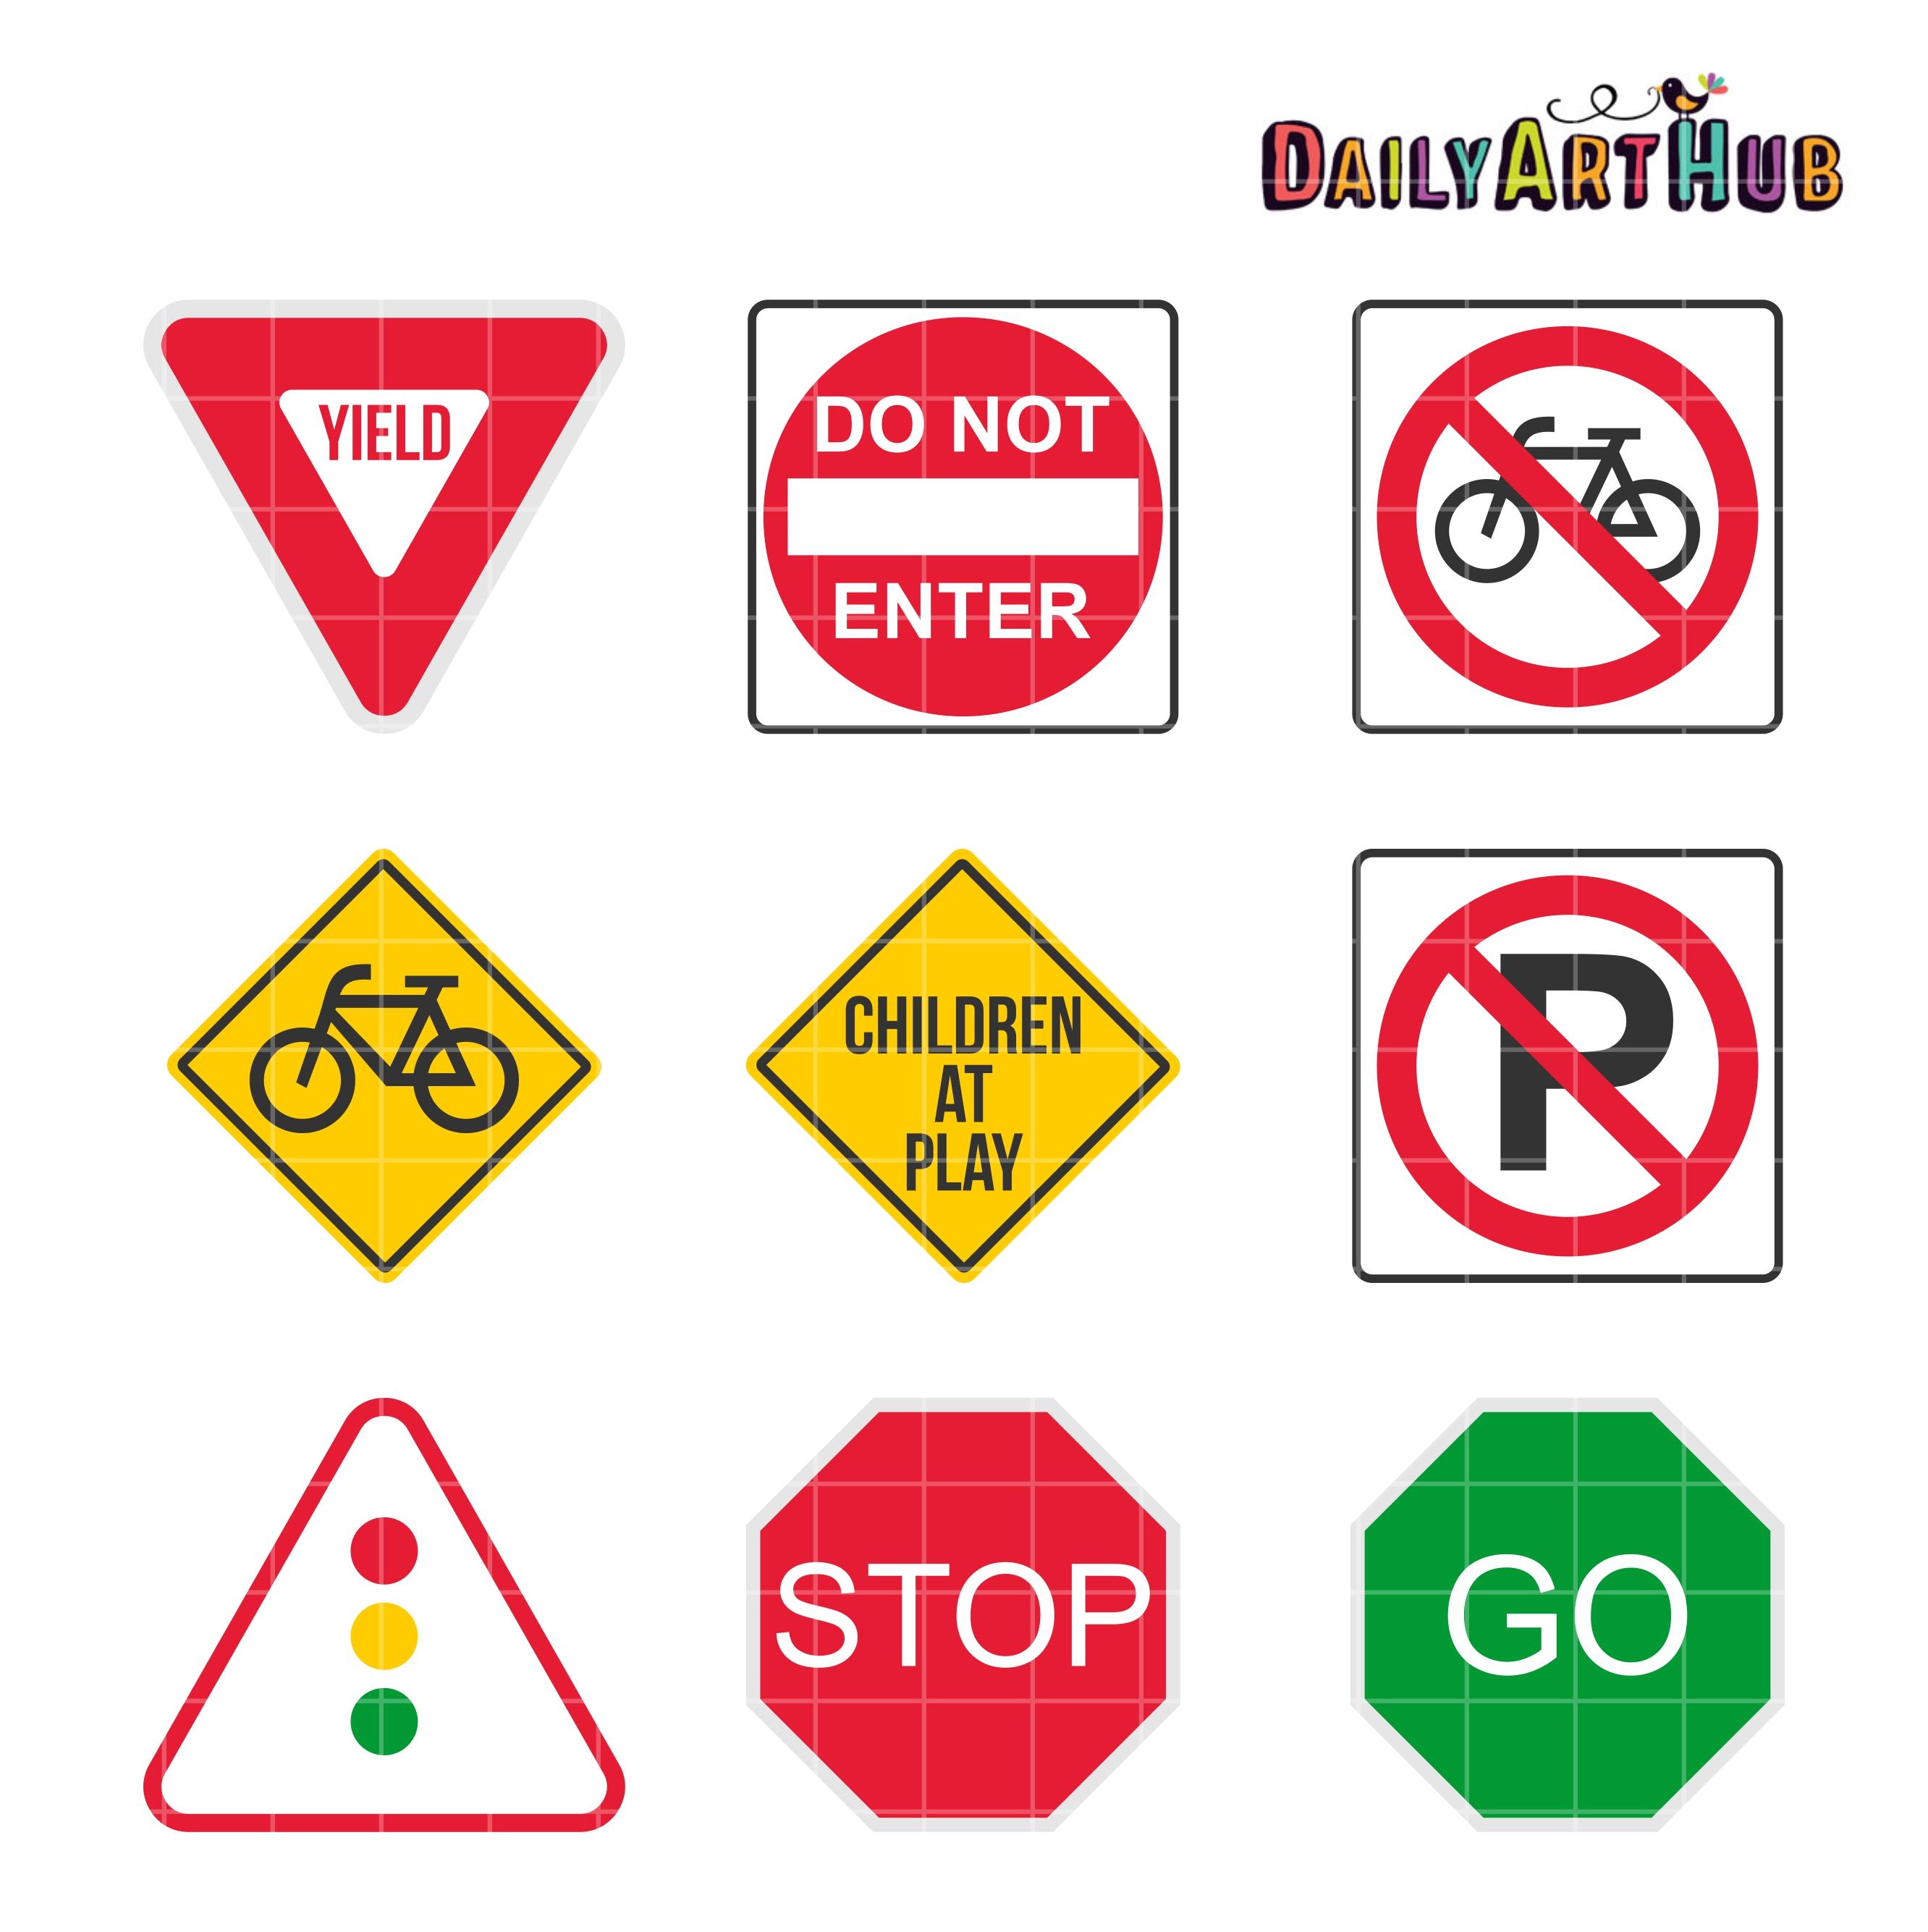 9 Road Signs Clip Art Set   Daily Art Hub